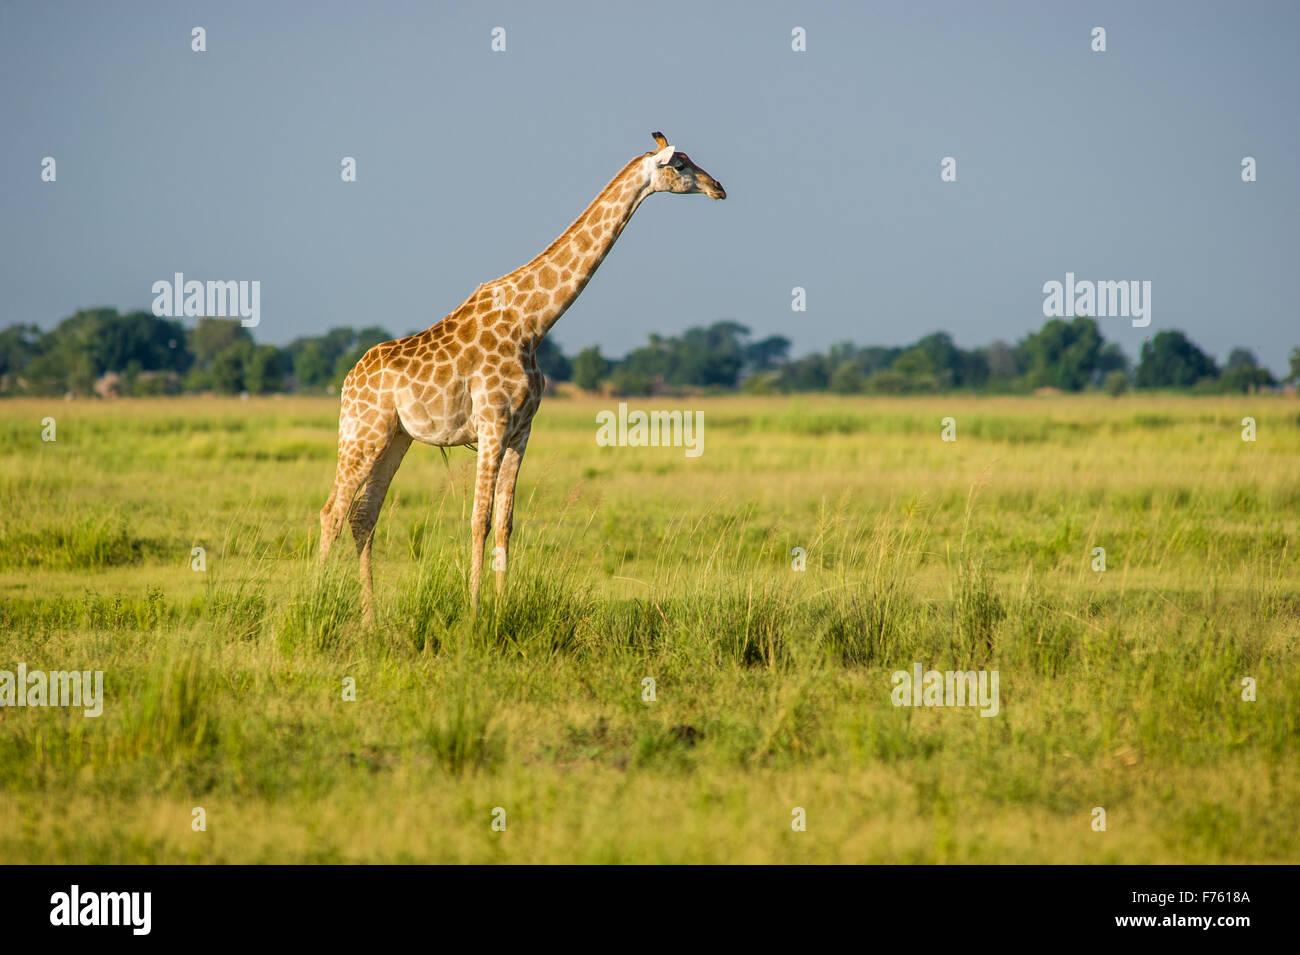 Kasane, Botswana - Chobe National Park Giraffe (Giraffa camelopardalis) - Stock Image